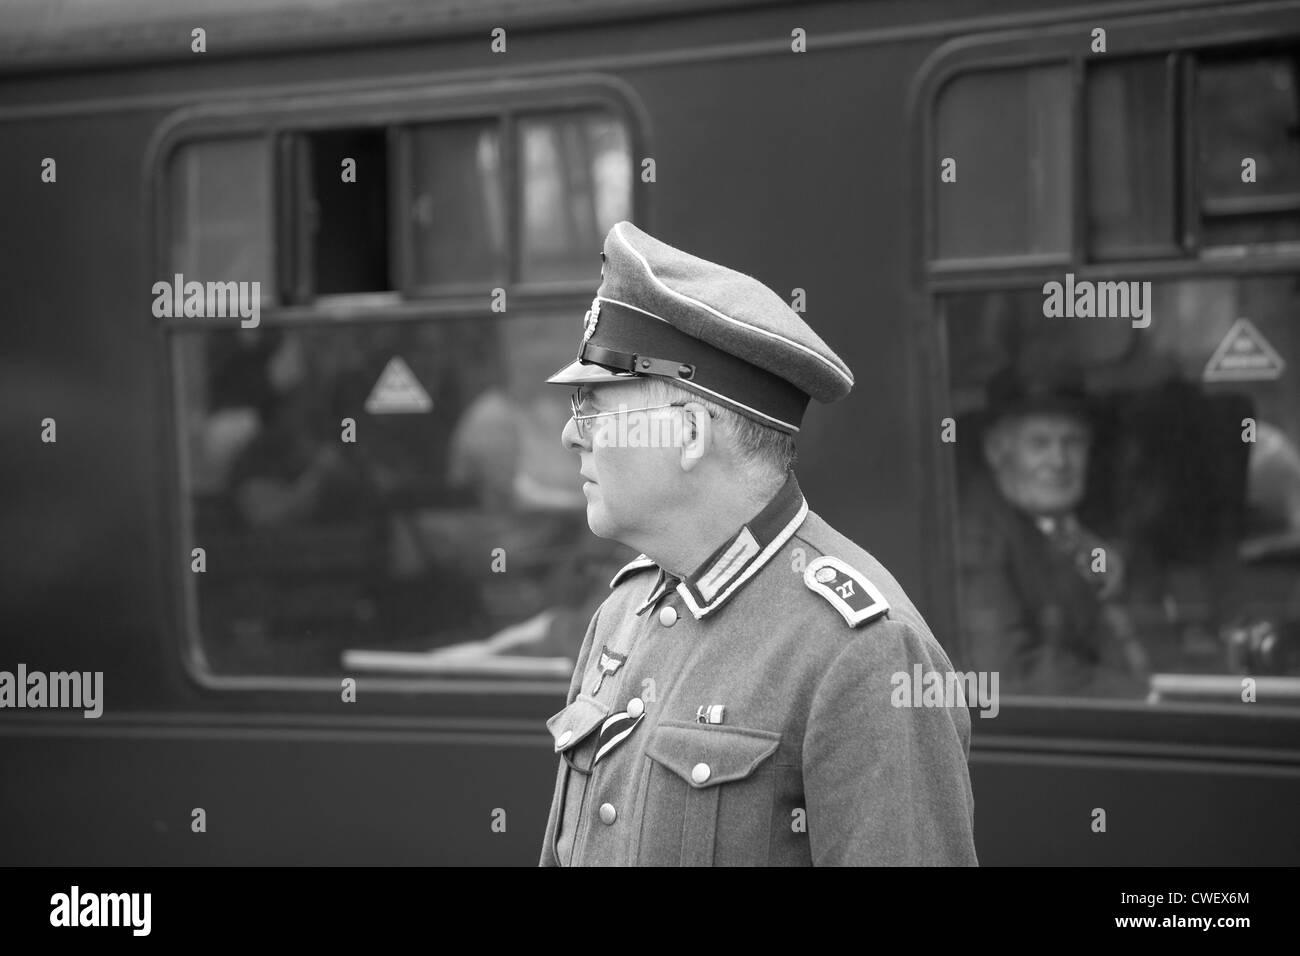 German Army Officer on Railway platform - Stock Image